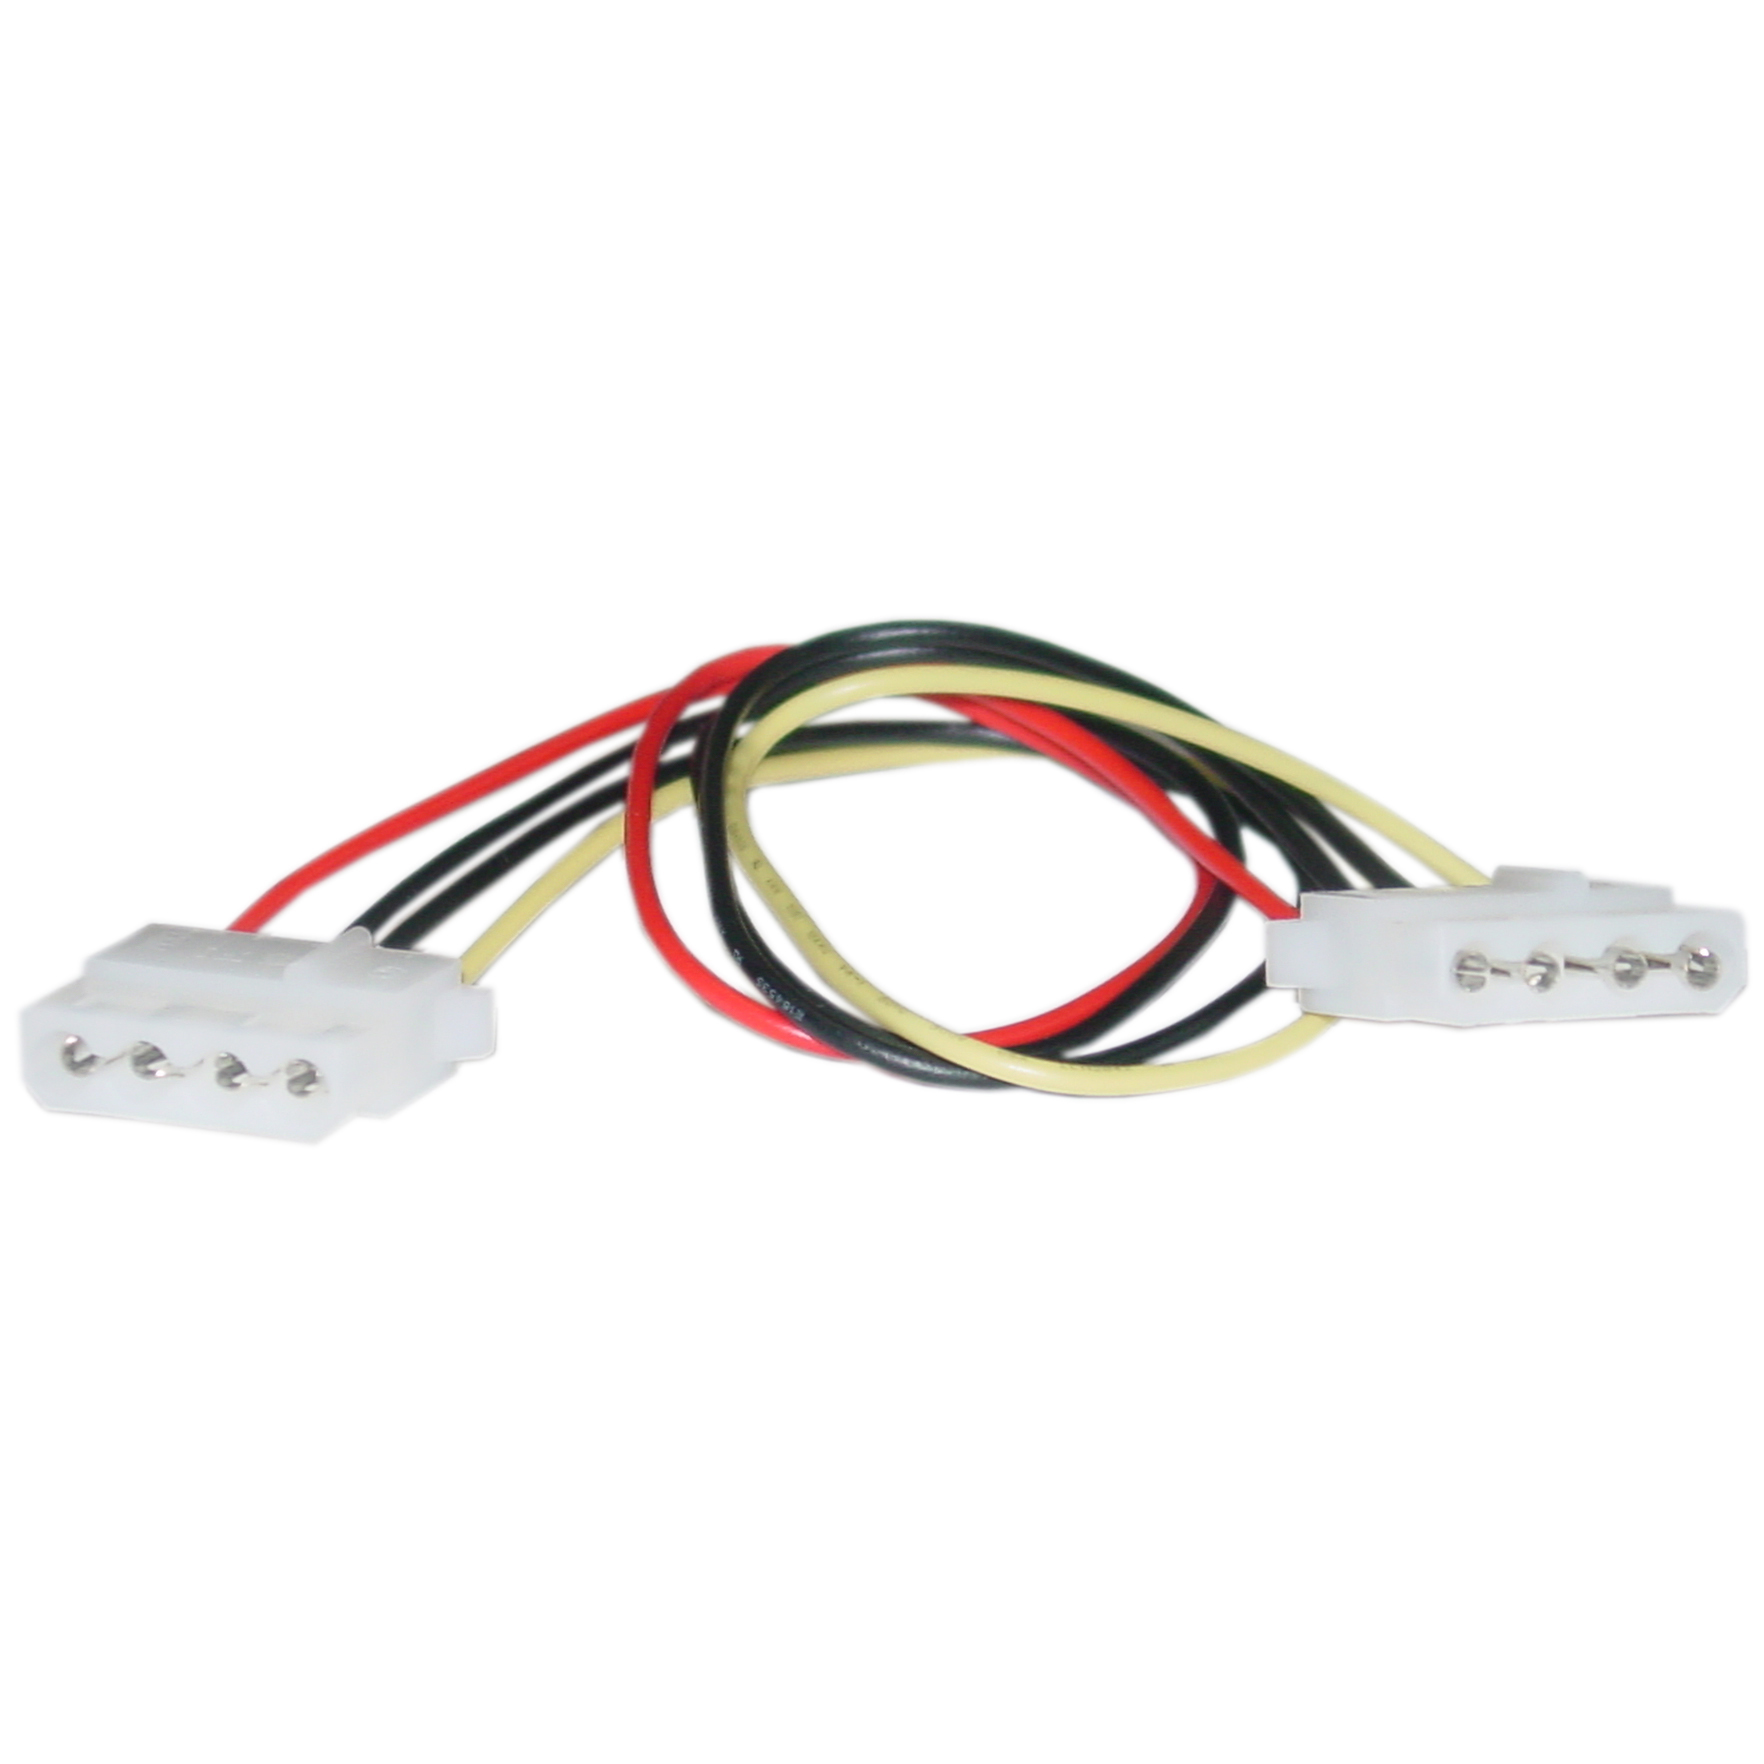 Offex 4 Pin Molex Cable, 5.25 inch Female to 5.25 inch Female, 12 inch - image 1 de 1